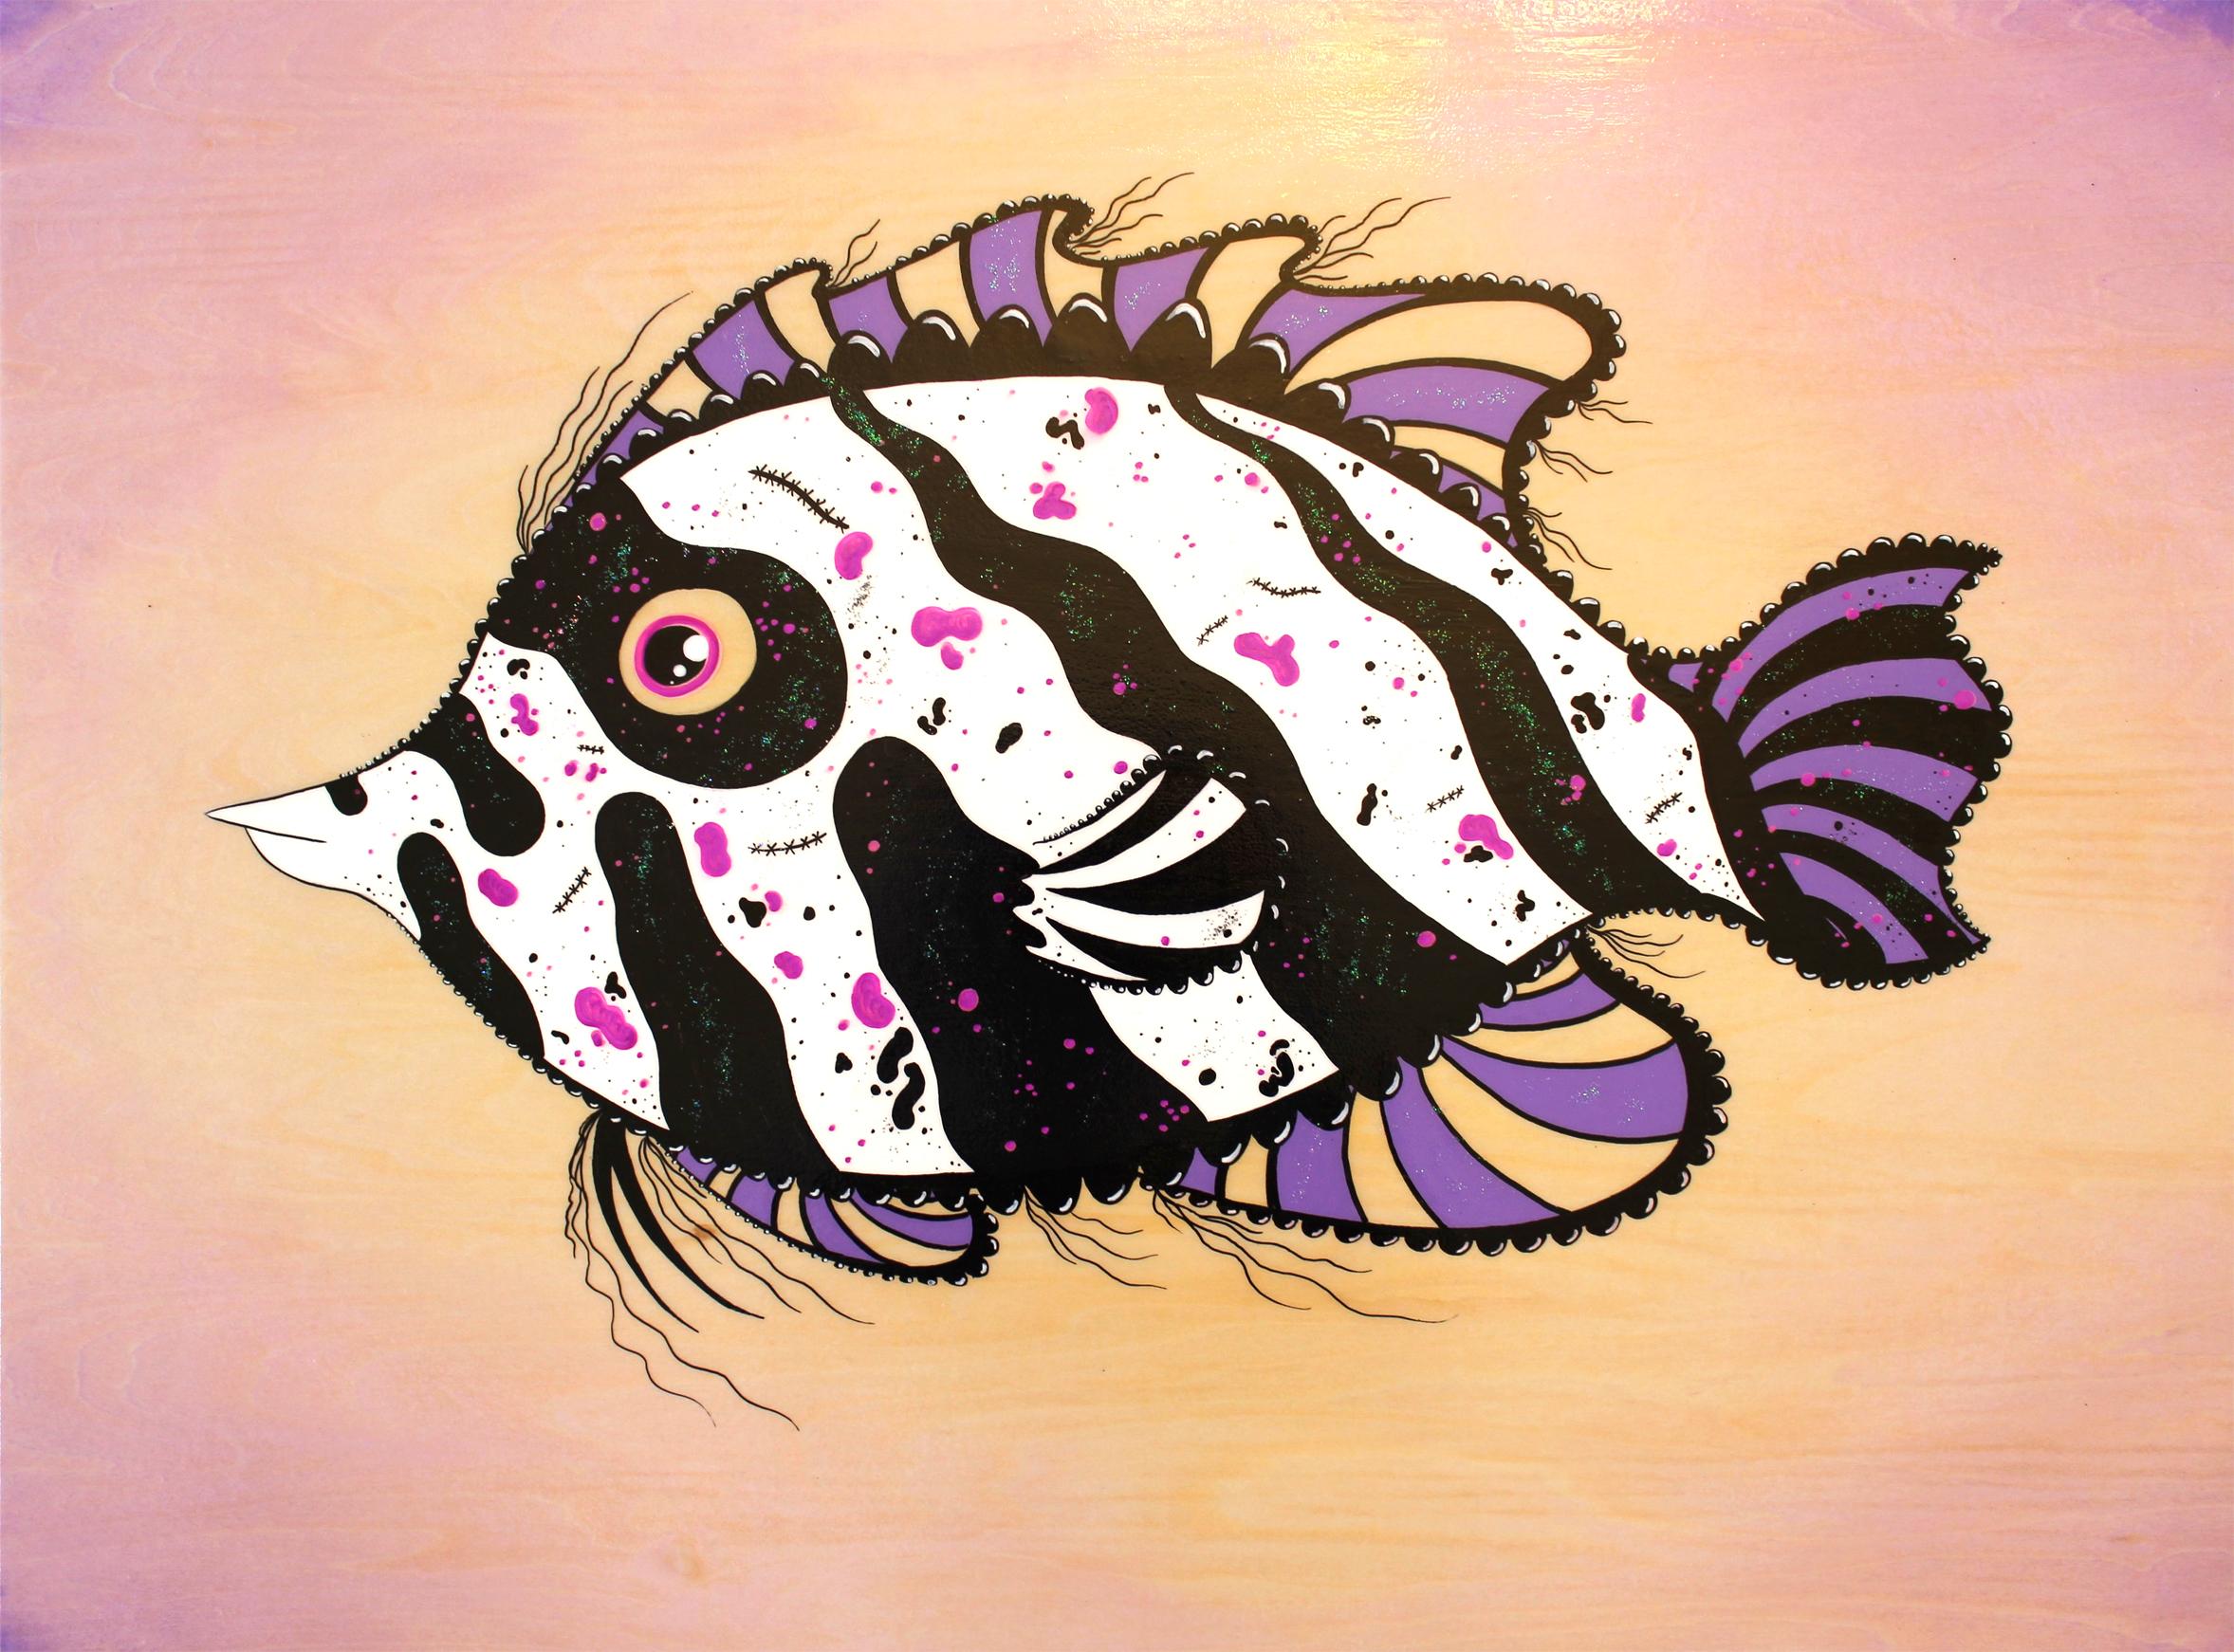 Big_BW_StripedFish_01.jpg